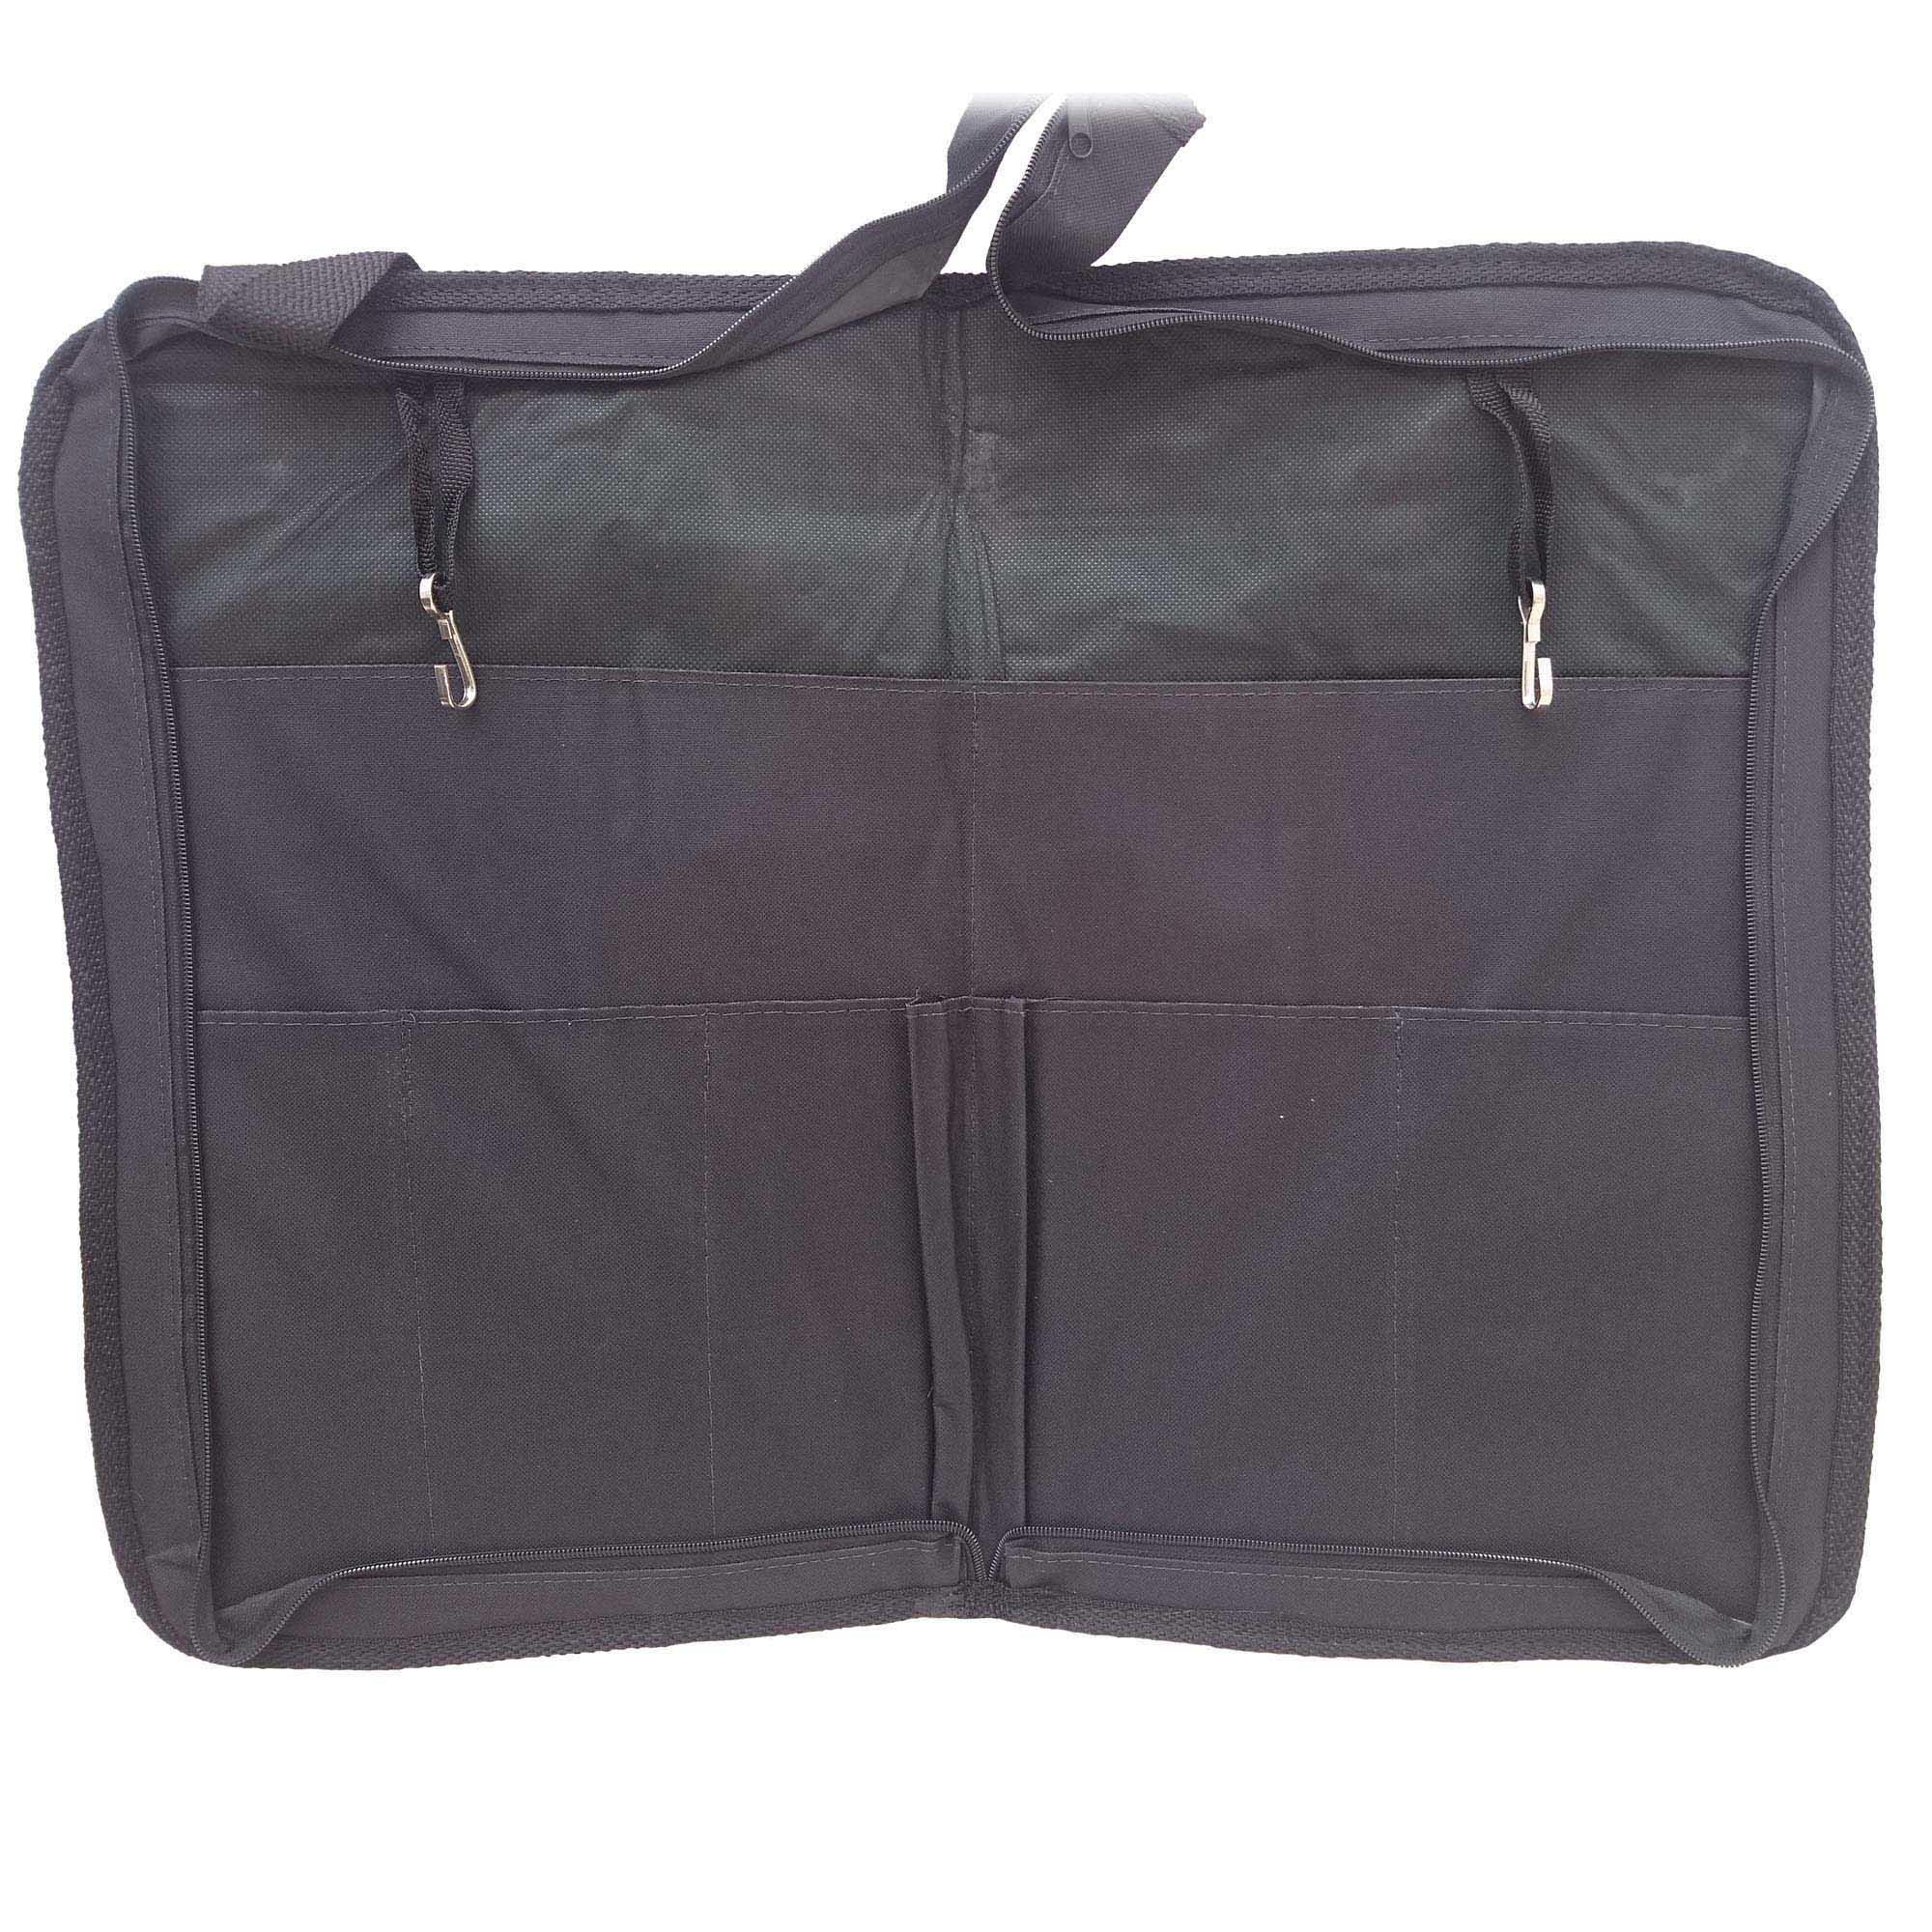 Capa Bag luxo LC Para Baquetas. Grande, cabe muitas baquetas. Baqueteira profissional. CLAVE & BAG. LU 704  - ROOSTERMUSIC